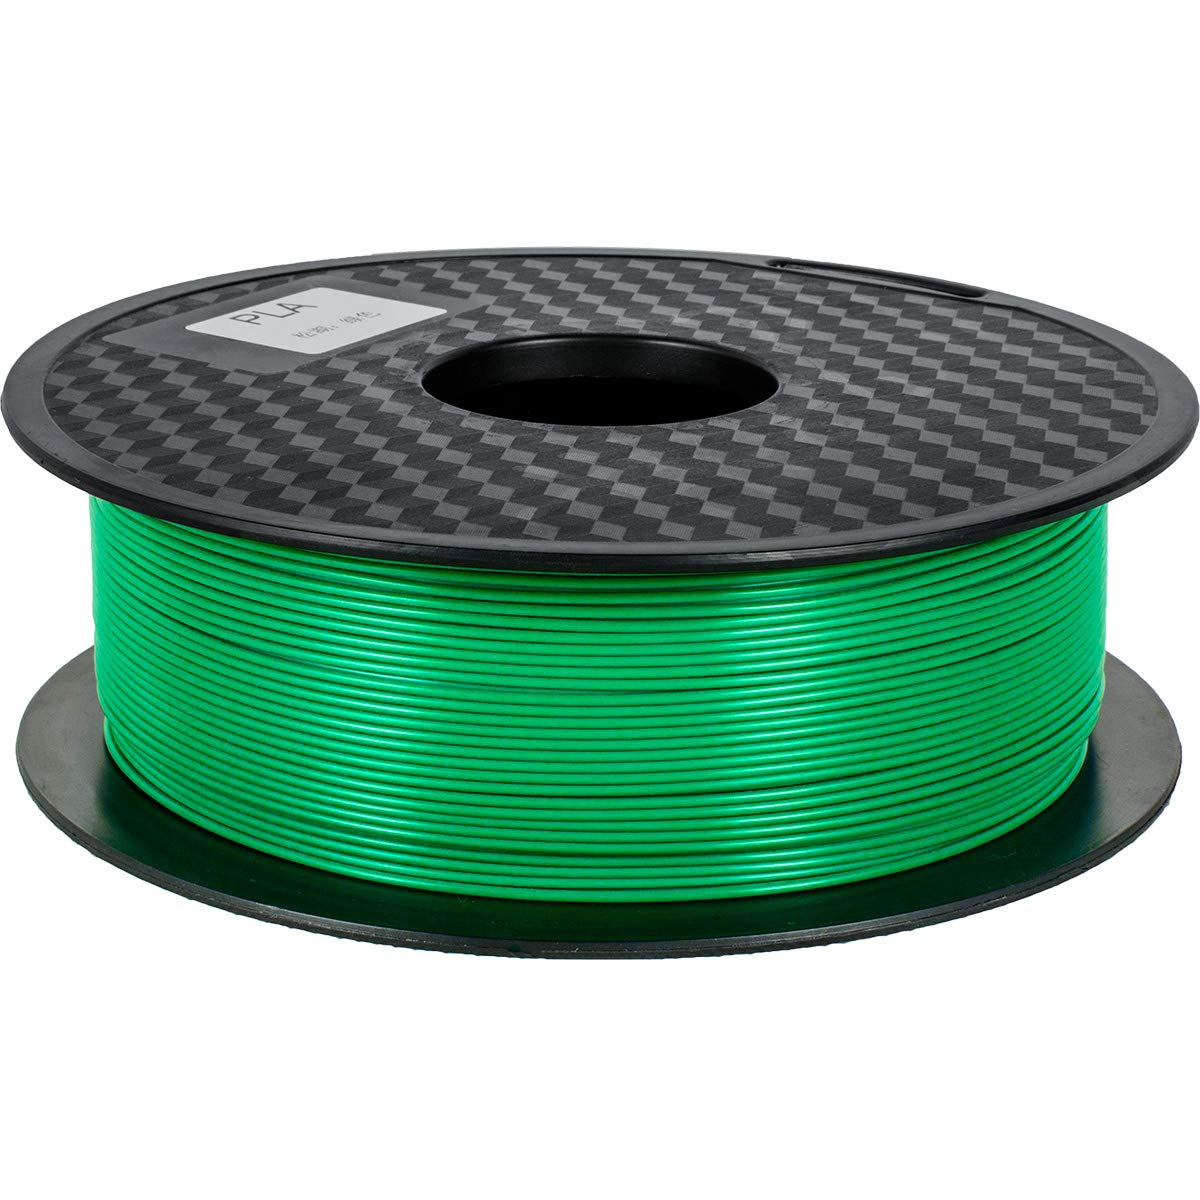 GIANTARM Imprimante 3D Filament PLA 1kg Spool PLA Filament 1.75mm Blanc